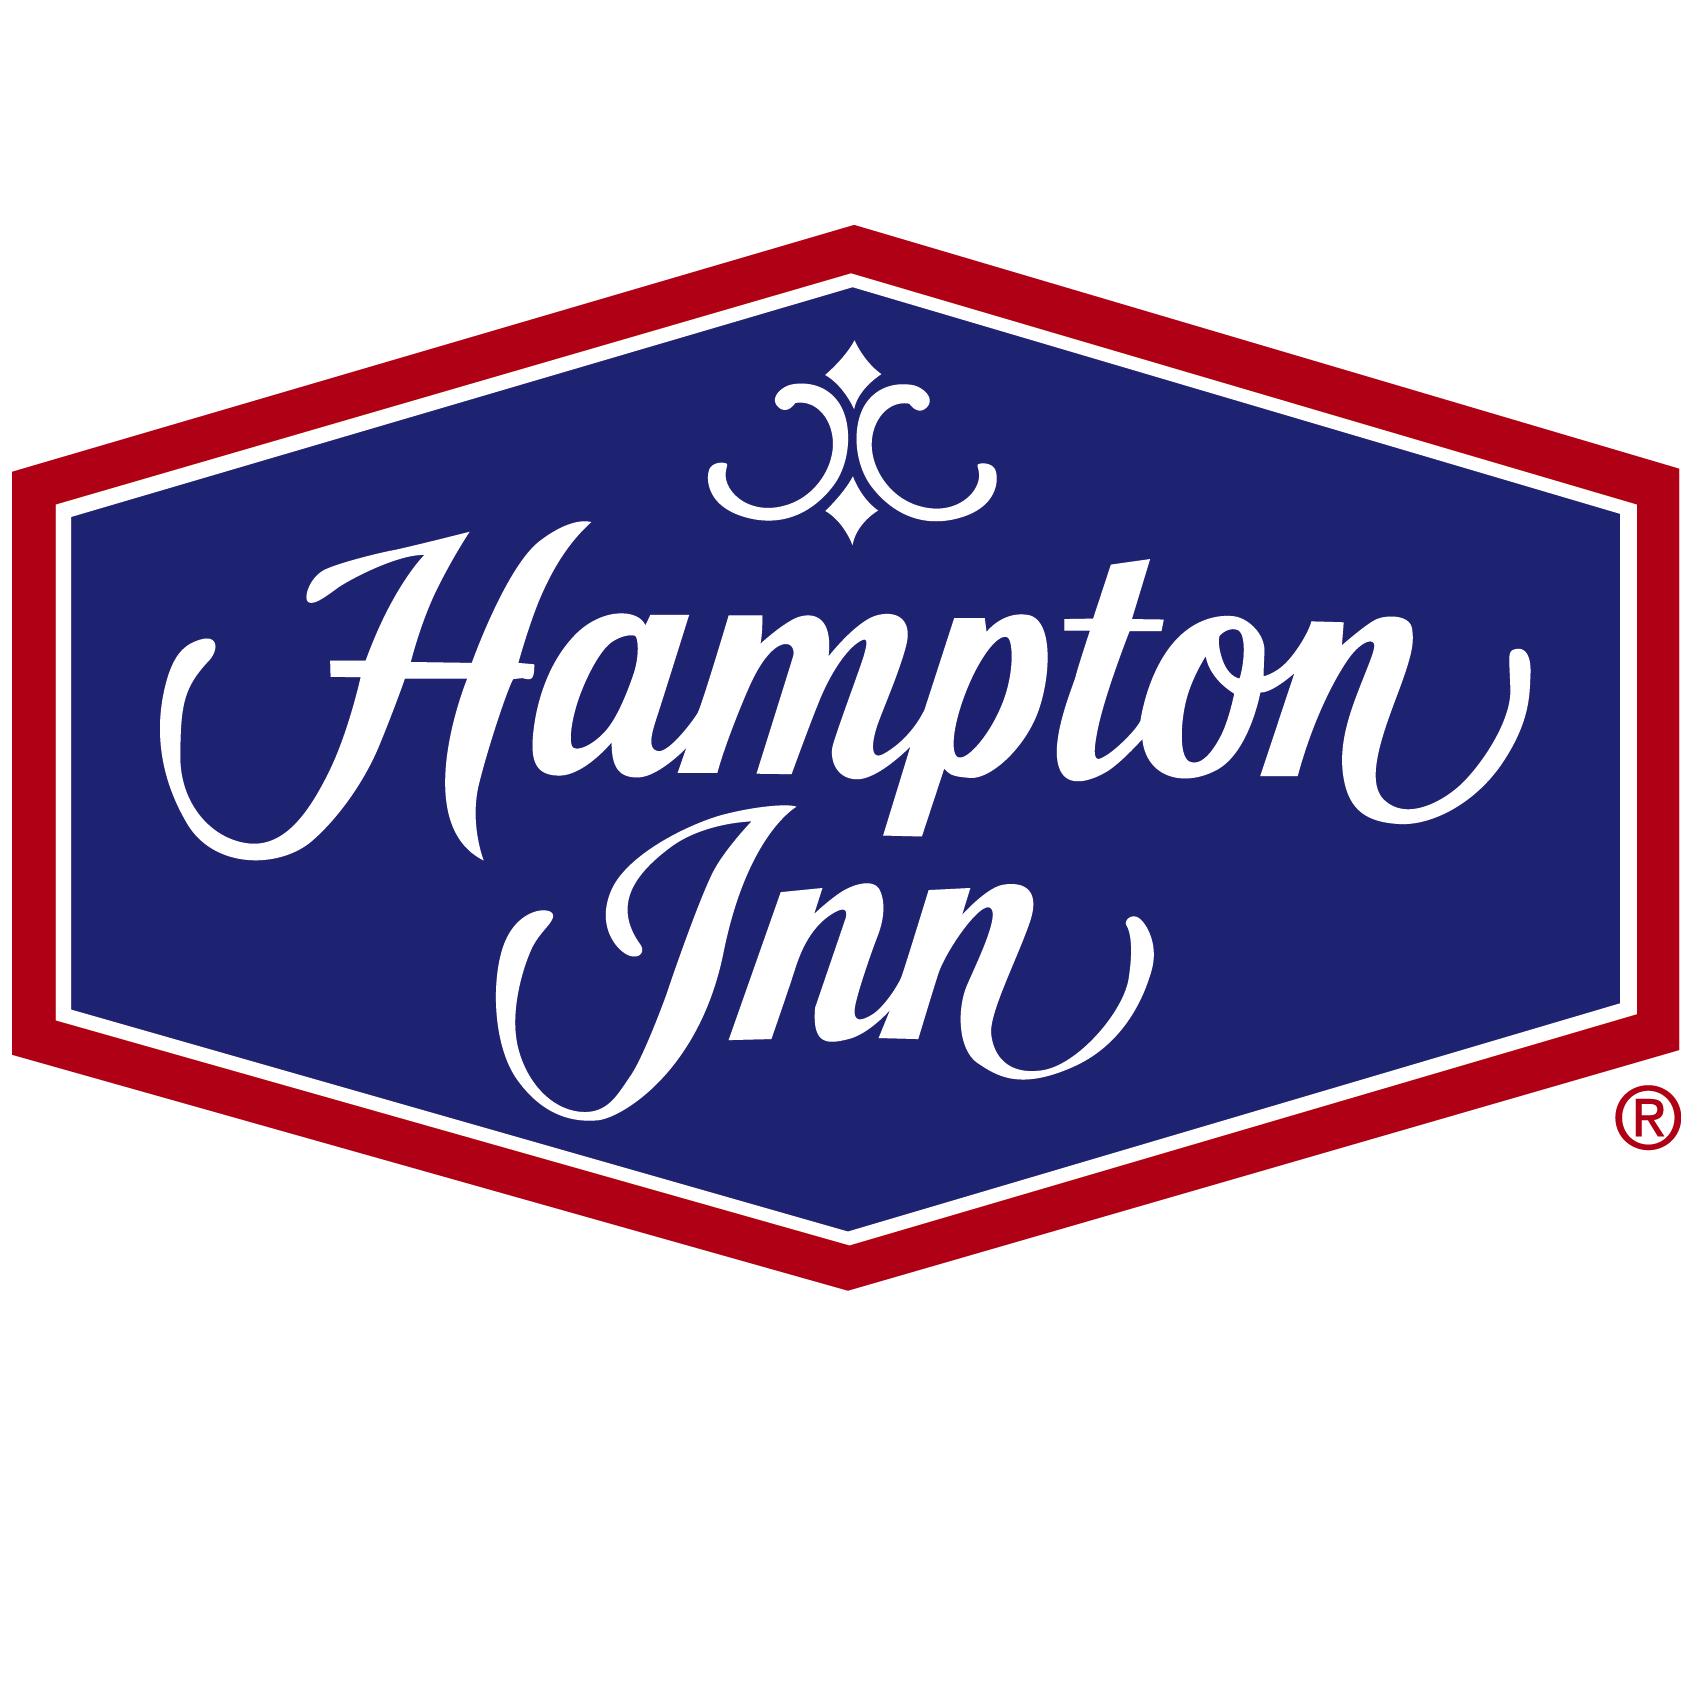 free hampton inn credit card authorization form - pdf